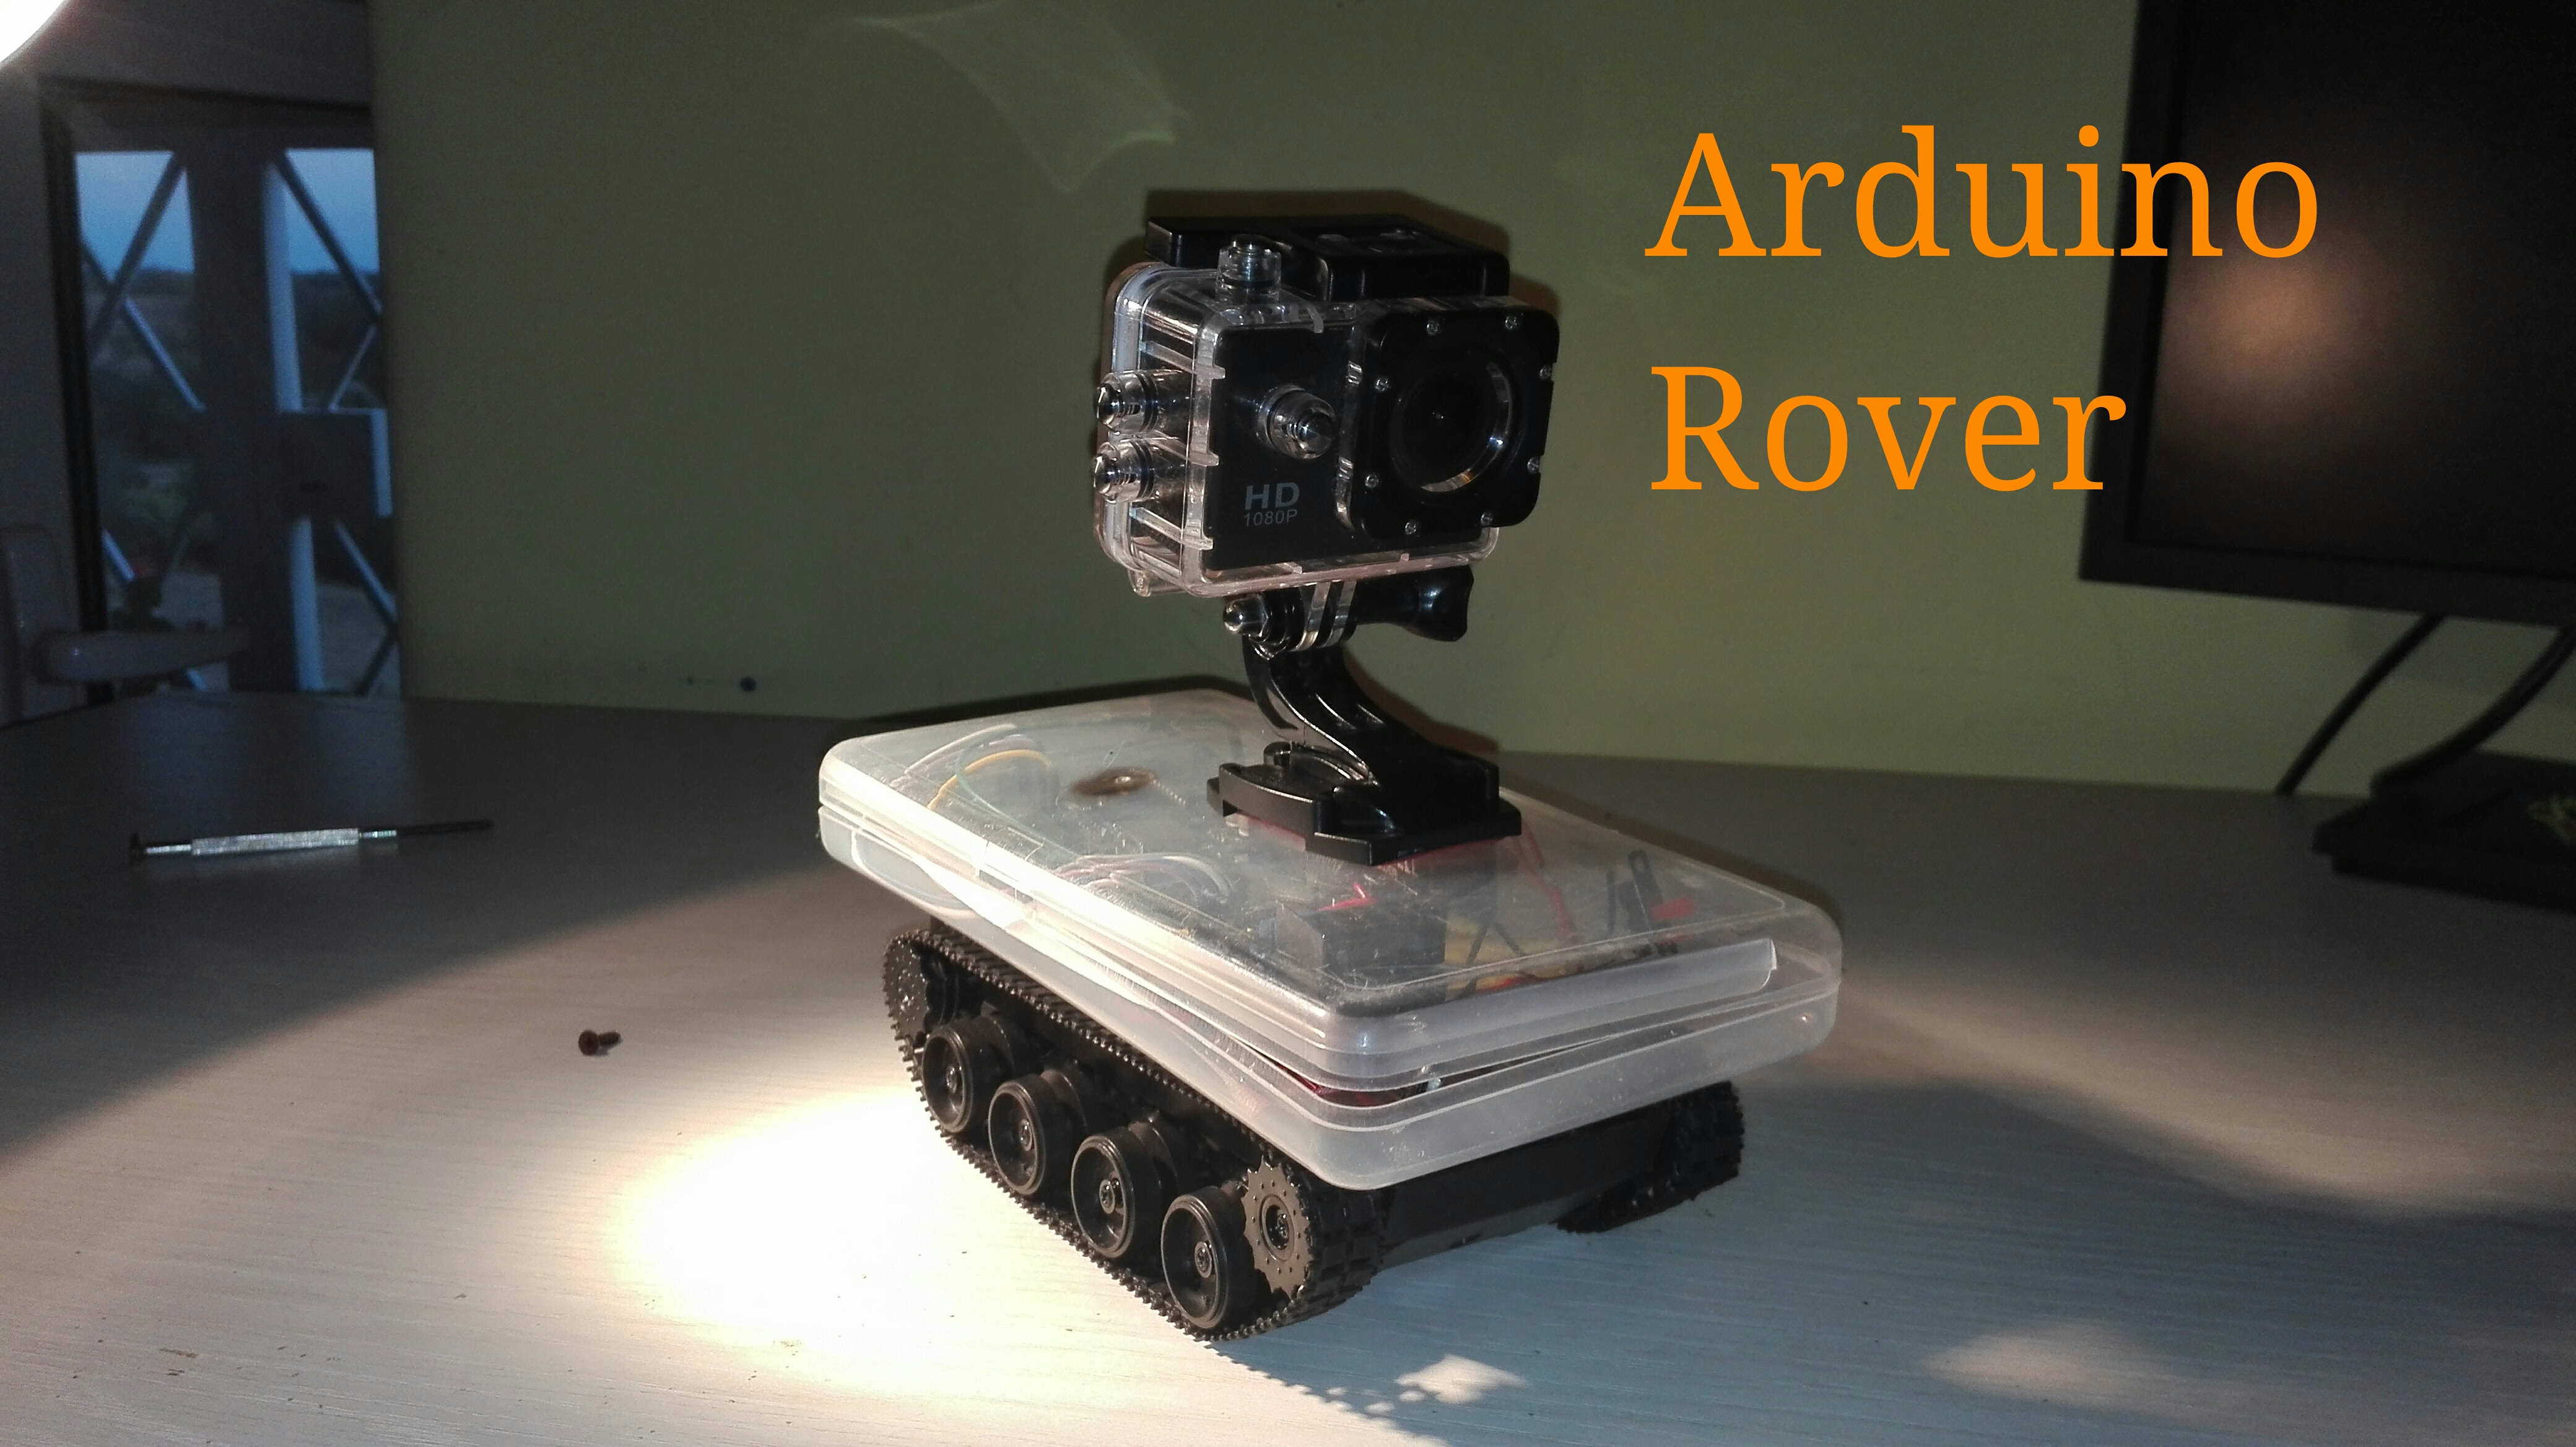 Arduino Bluethooth Exploration Rover